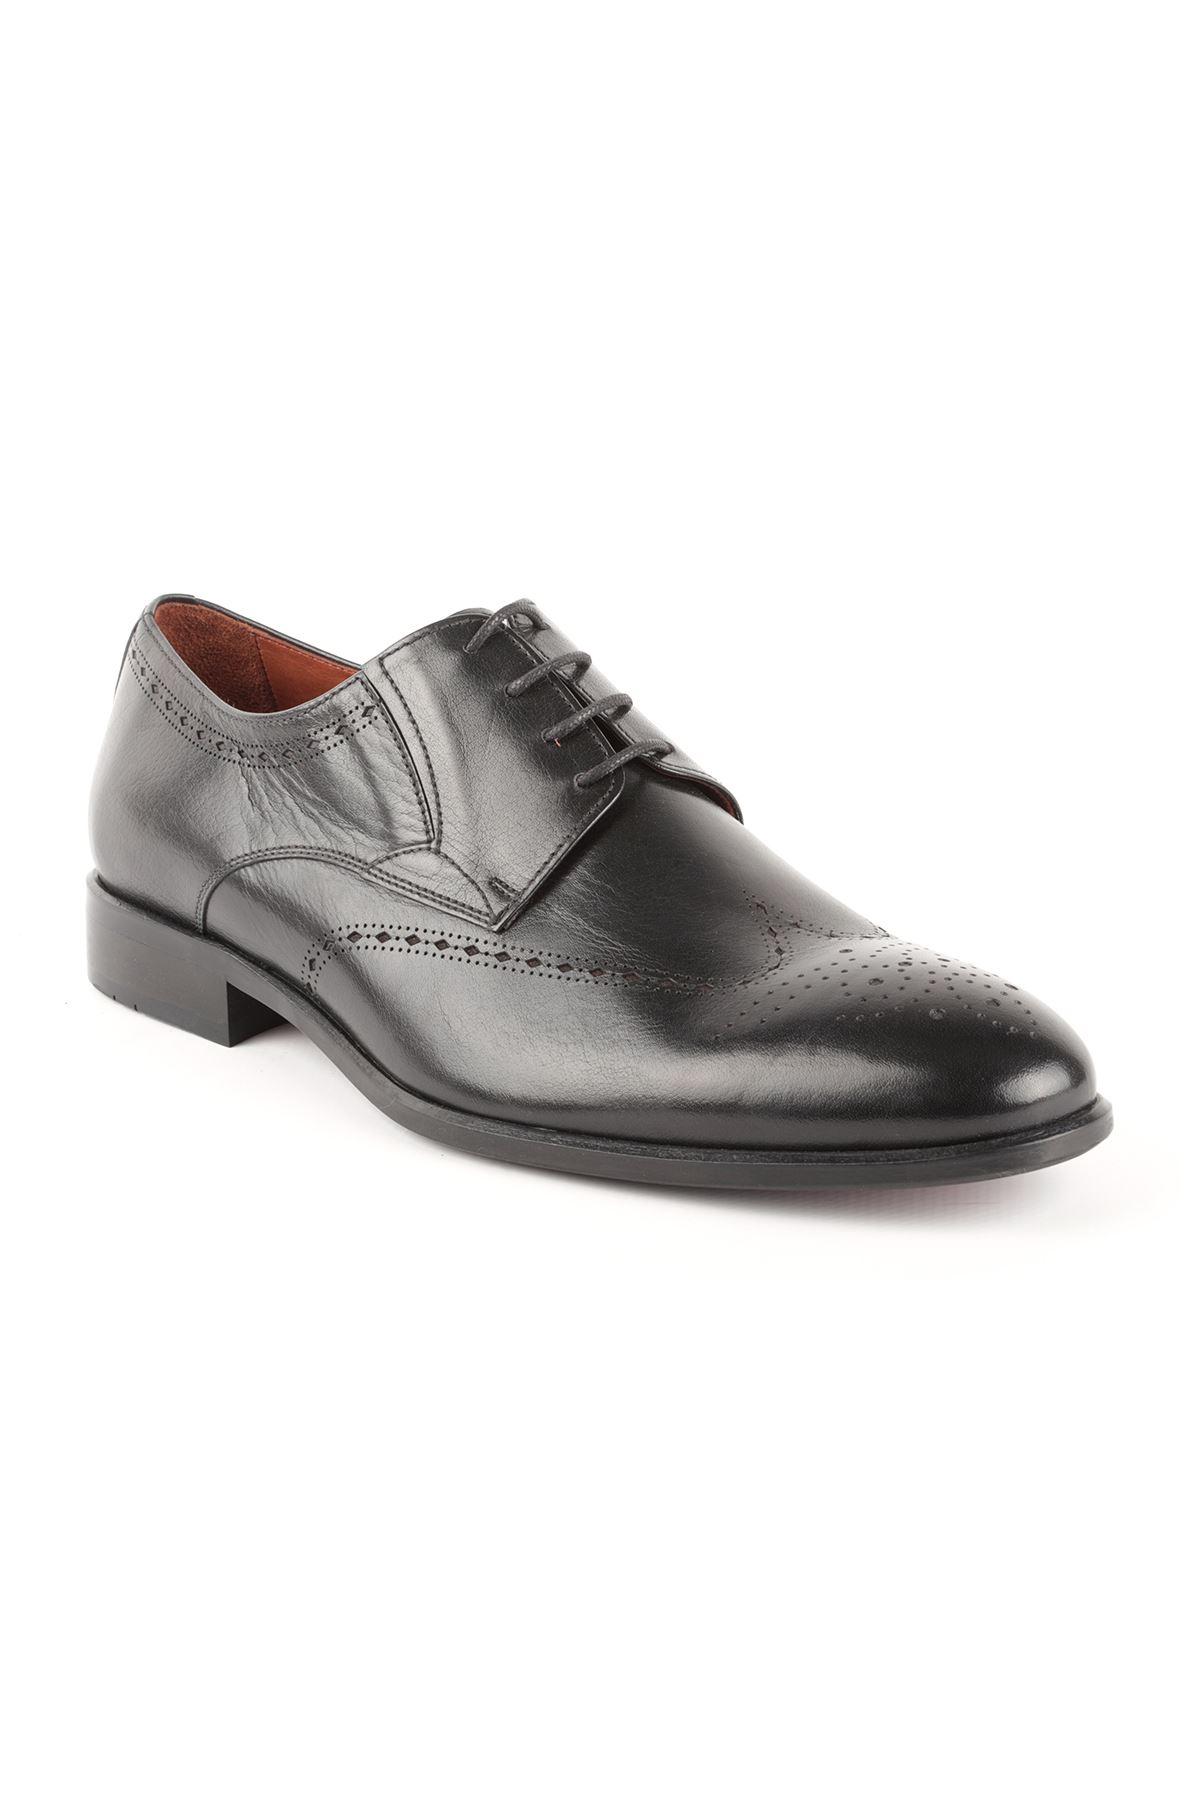 Libero T1419 Black Classic Shoes